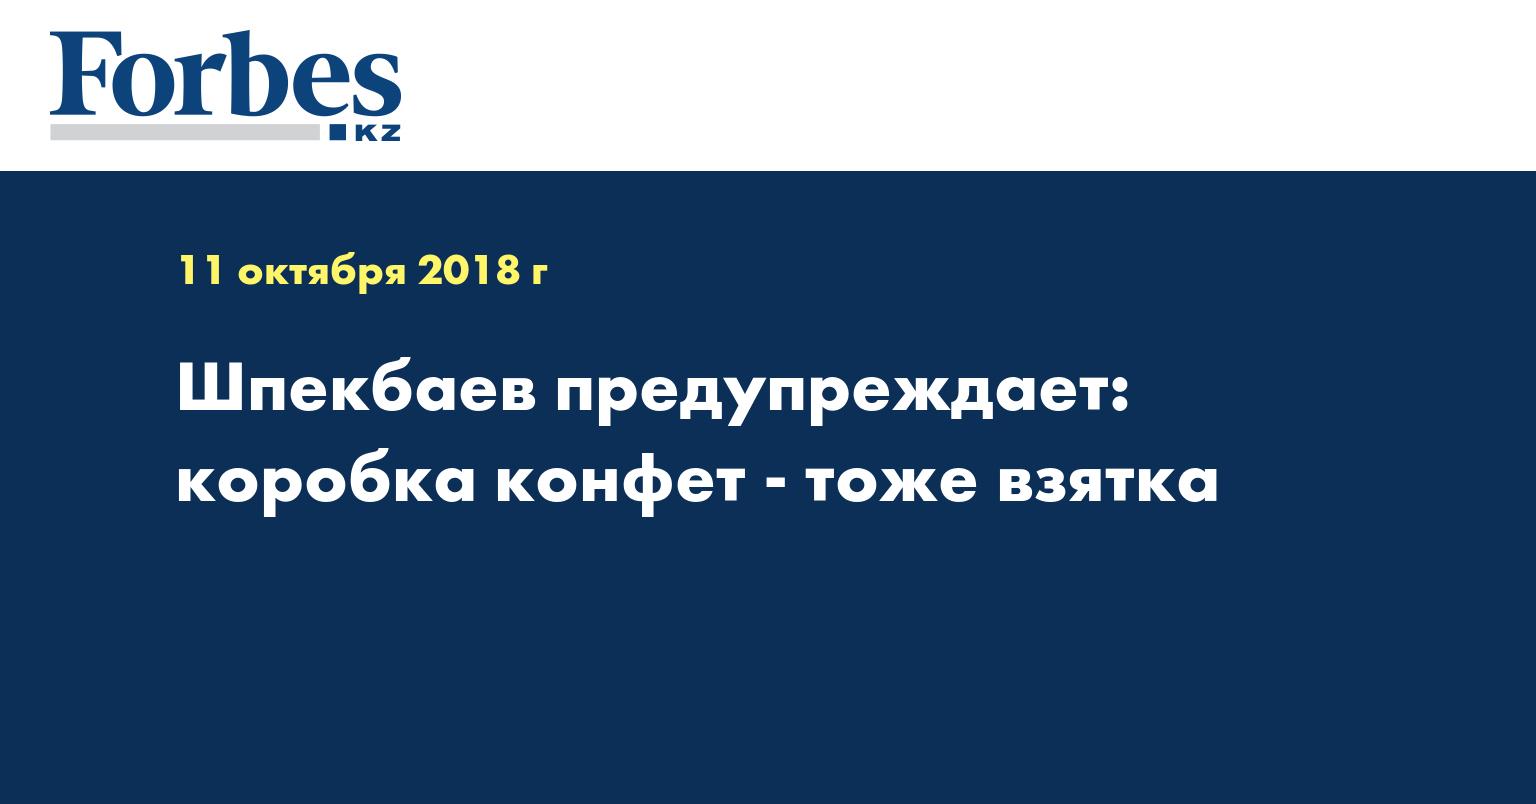 Шпекбаев предупреждает: коробка конфет - тоже взятка